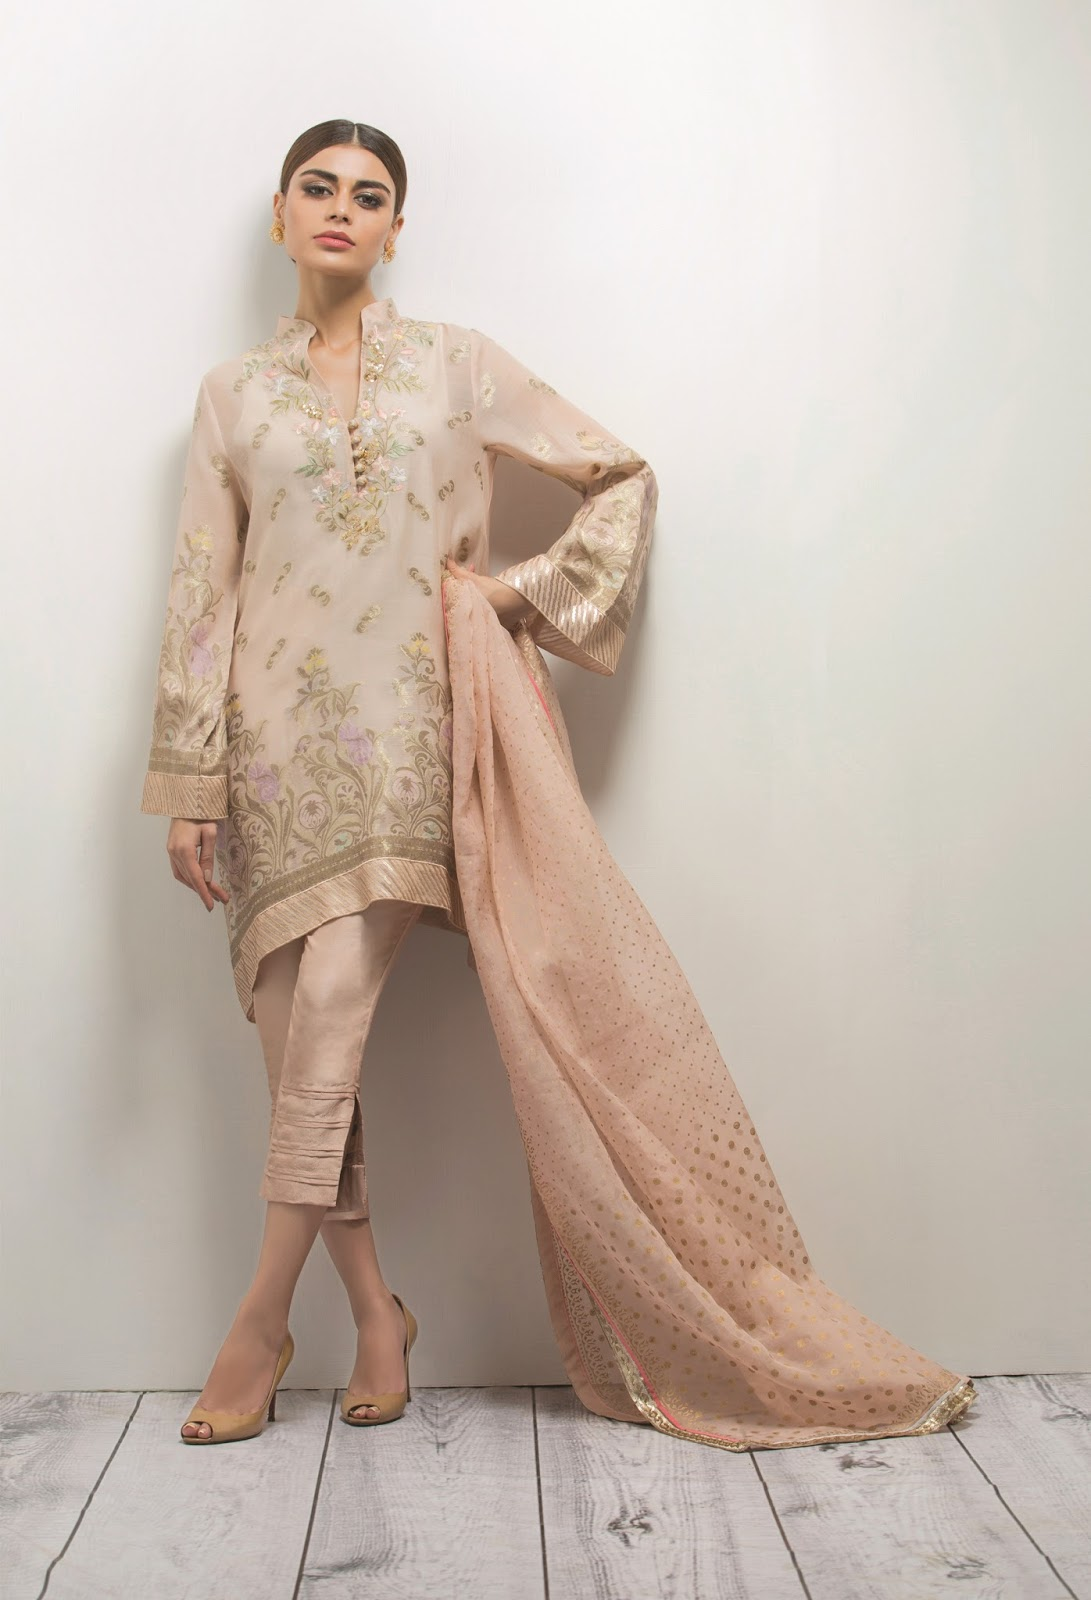 Pakistani actress model Sadaf Kanwal